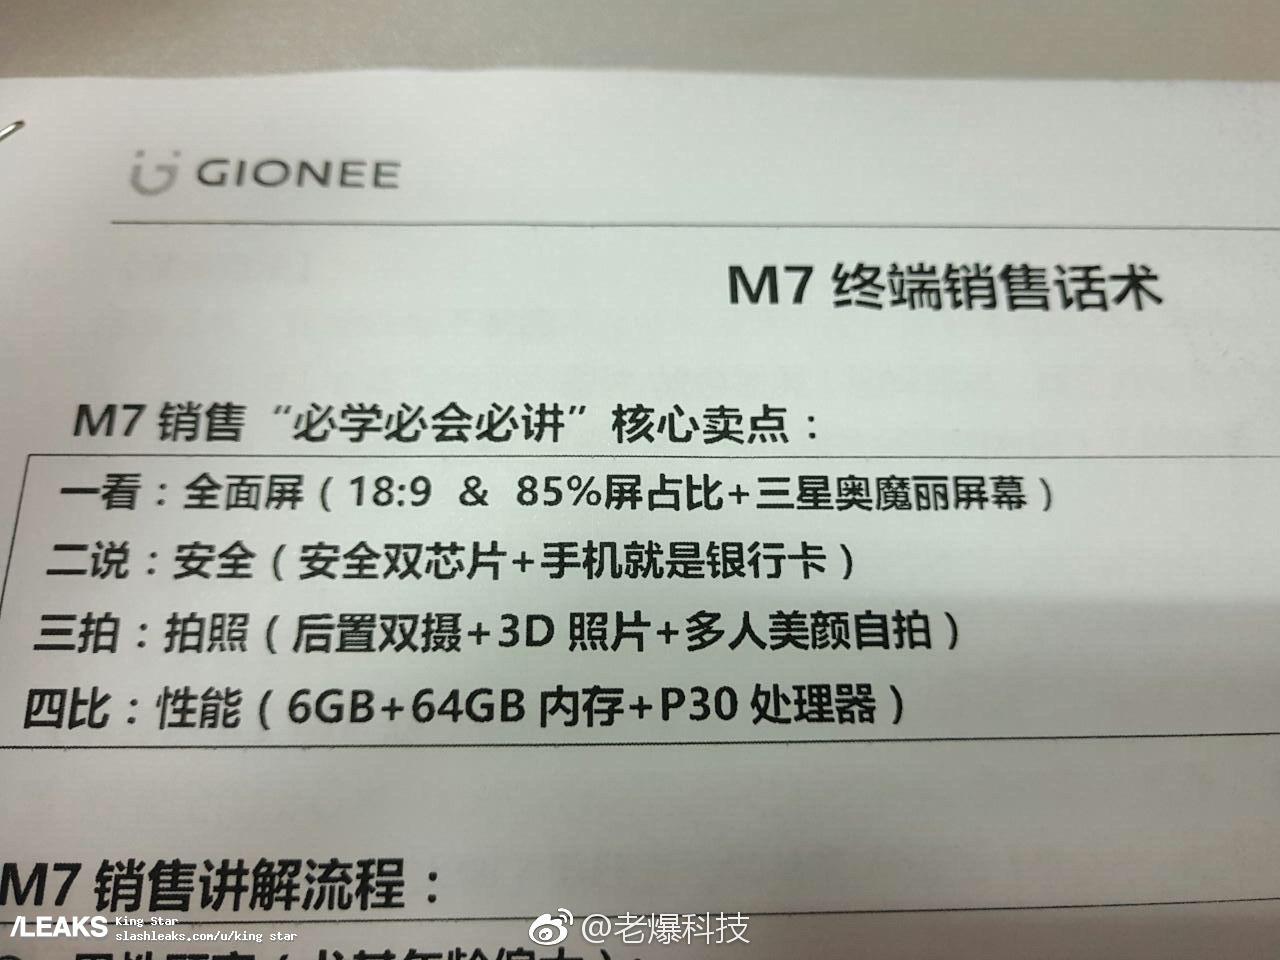 img Gionee M7 specs leaked